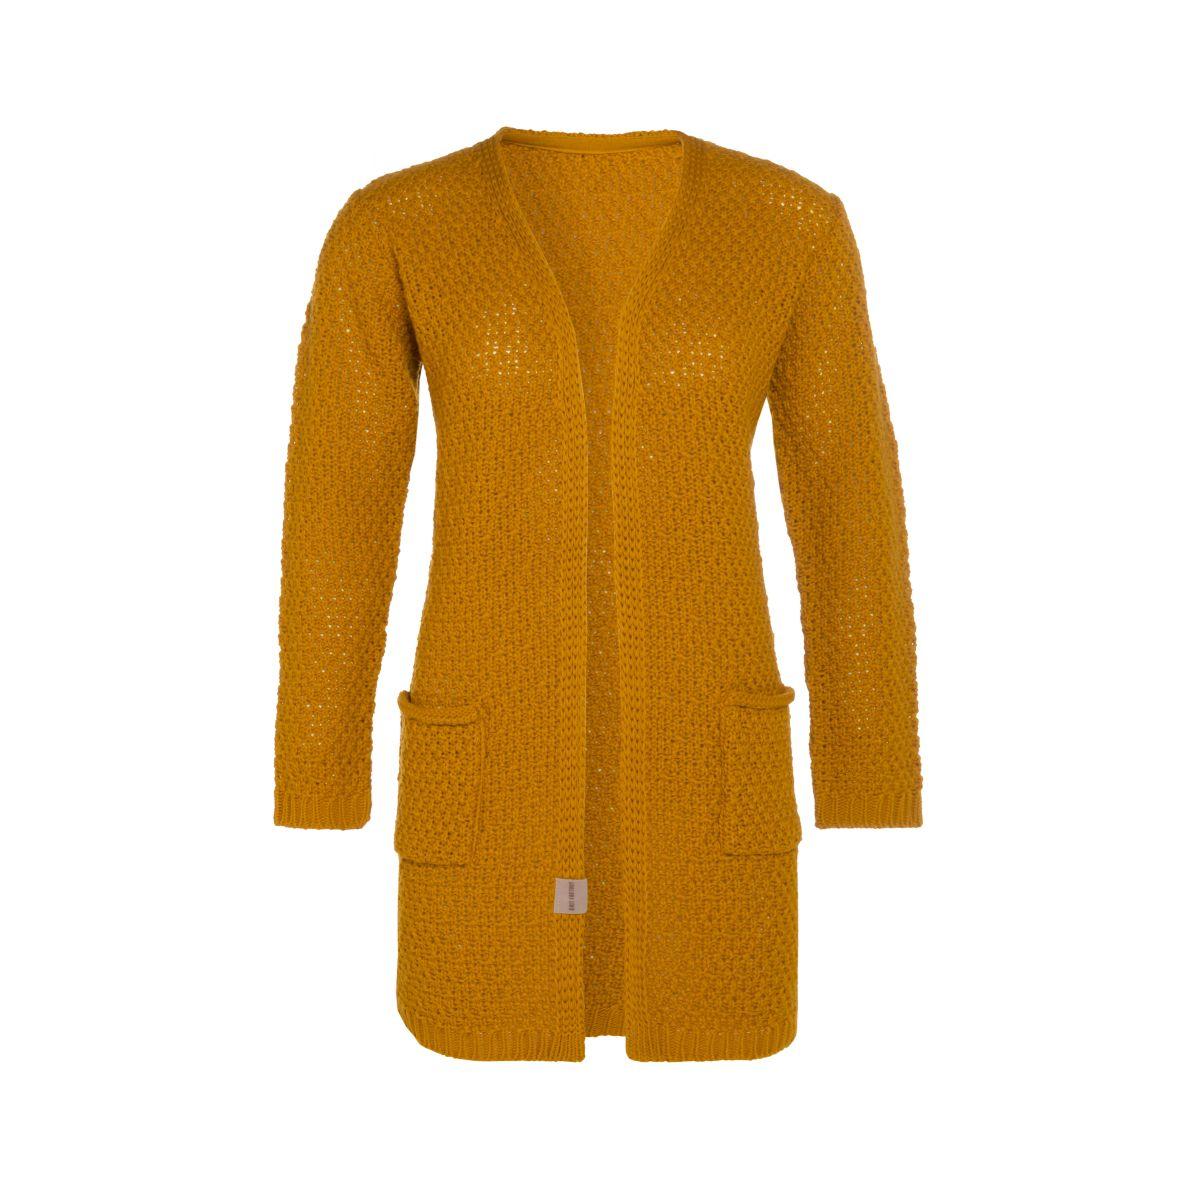 knit factory kf13308101749 luna vest oker 3638 1